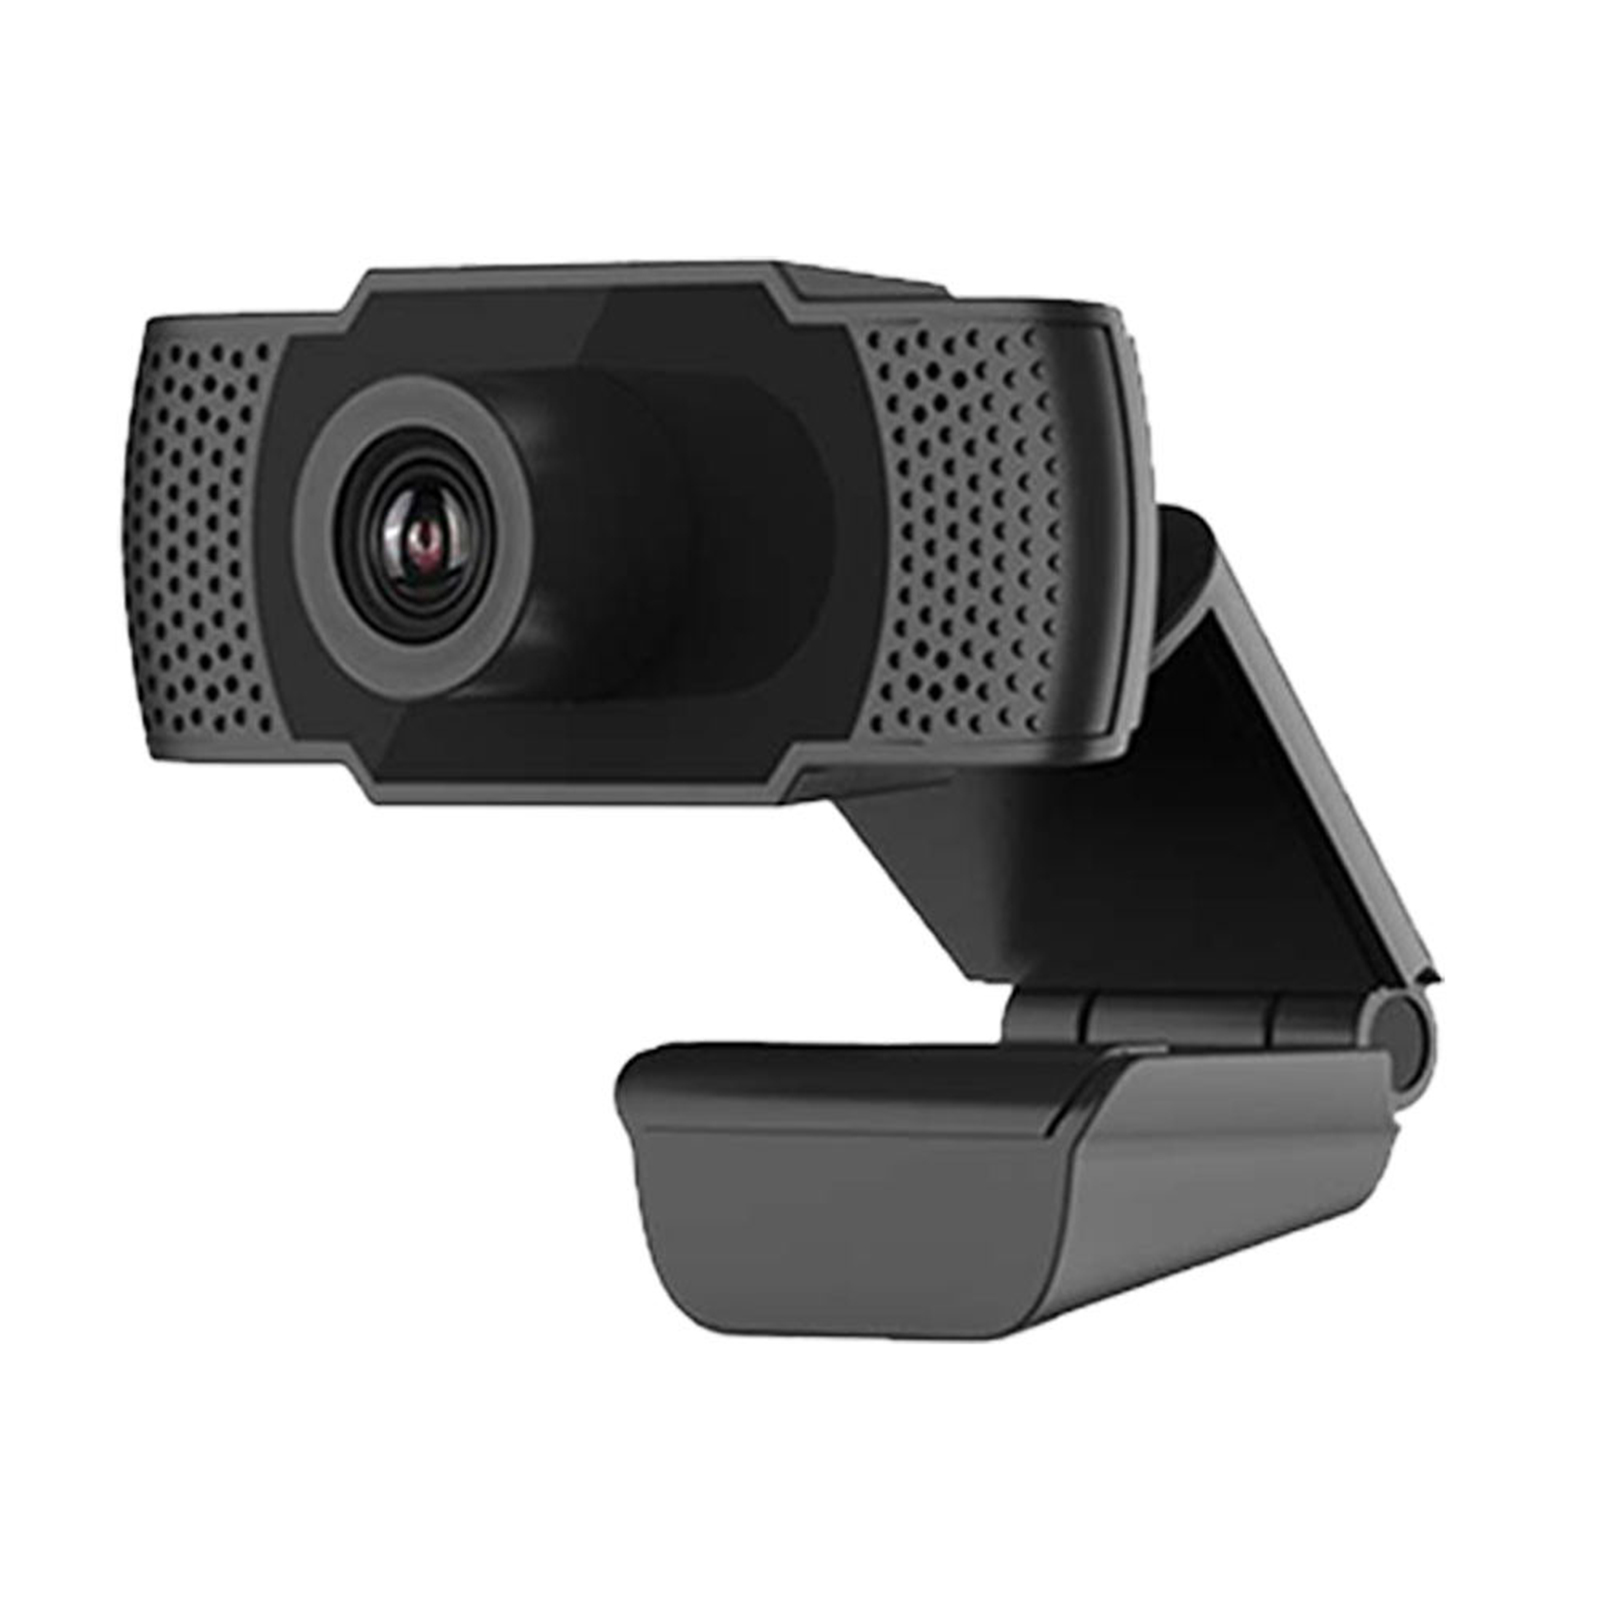 Q9 1080P High Definition Webcam with Mic USB Camera Web